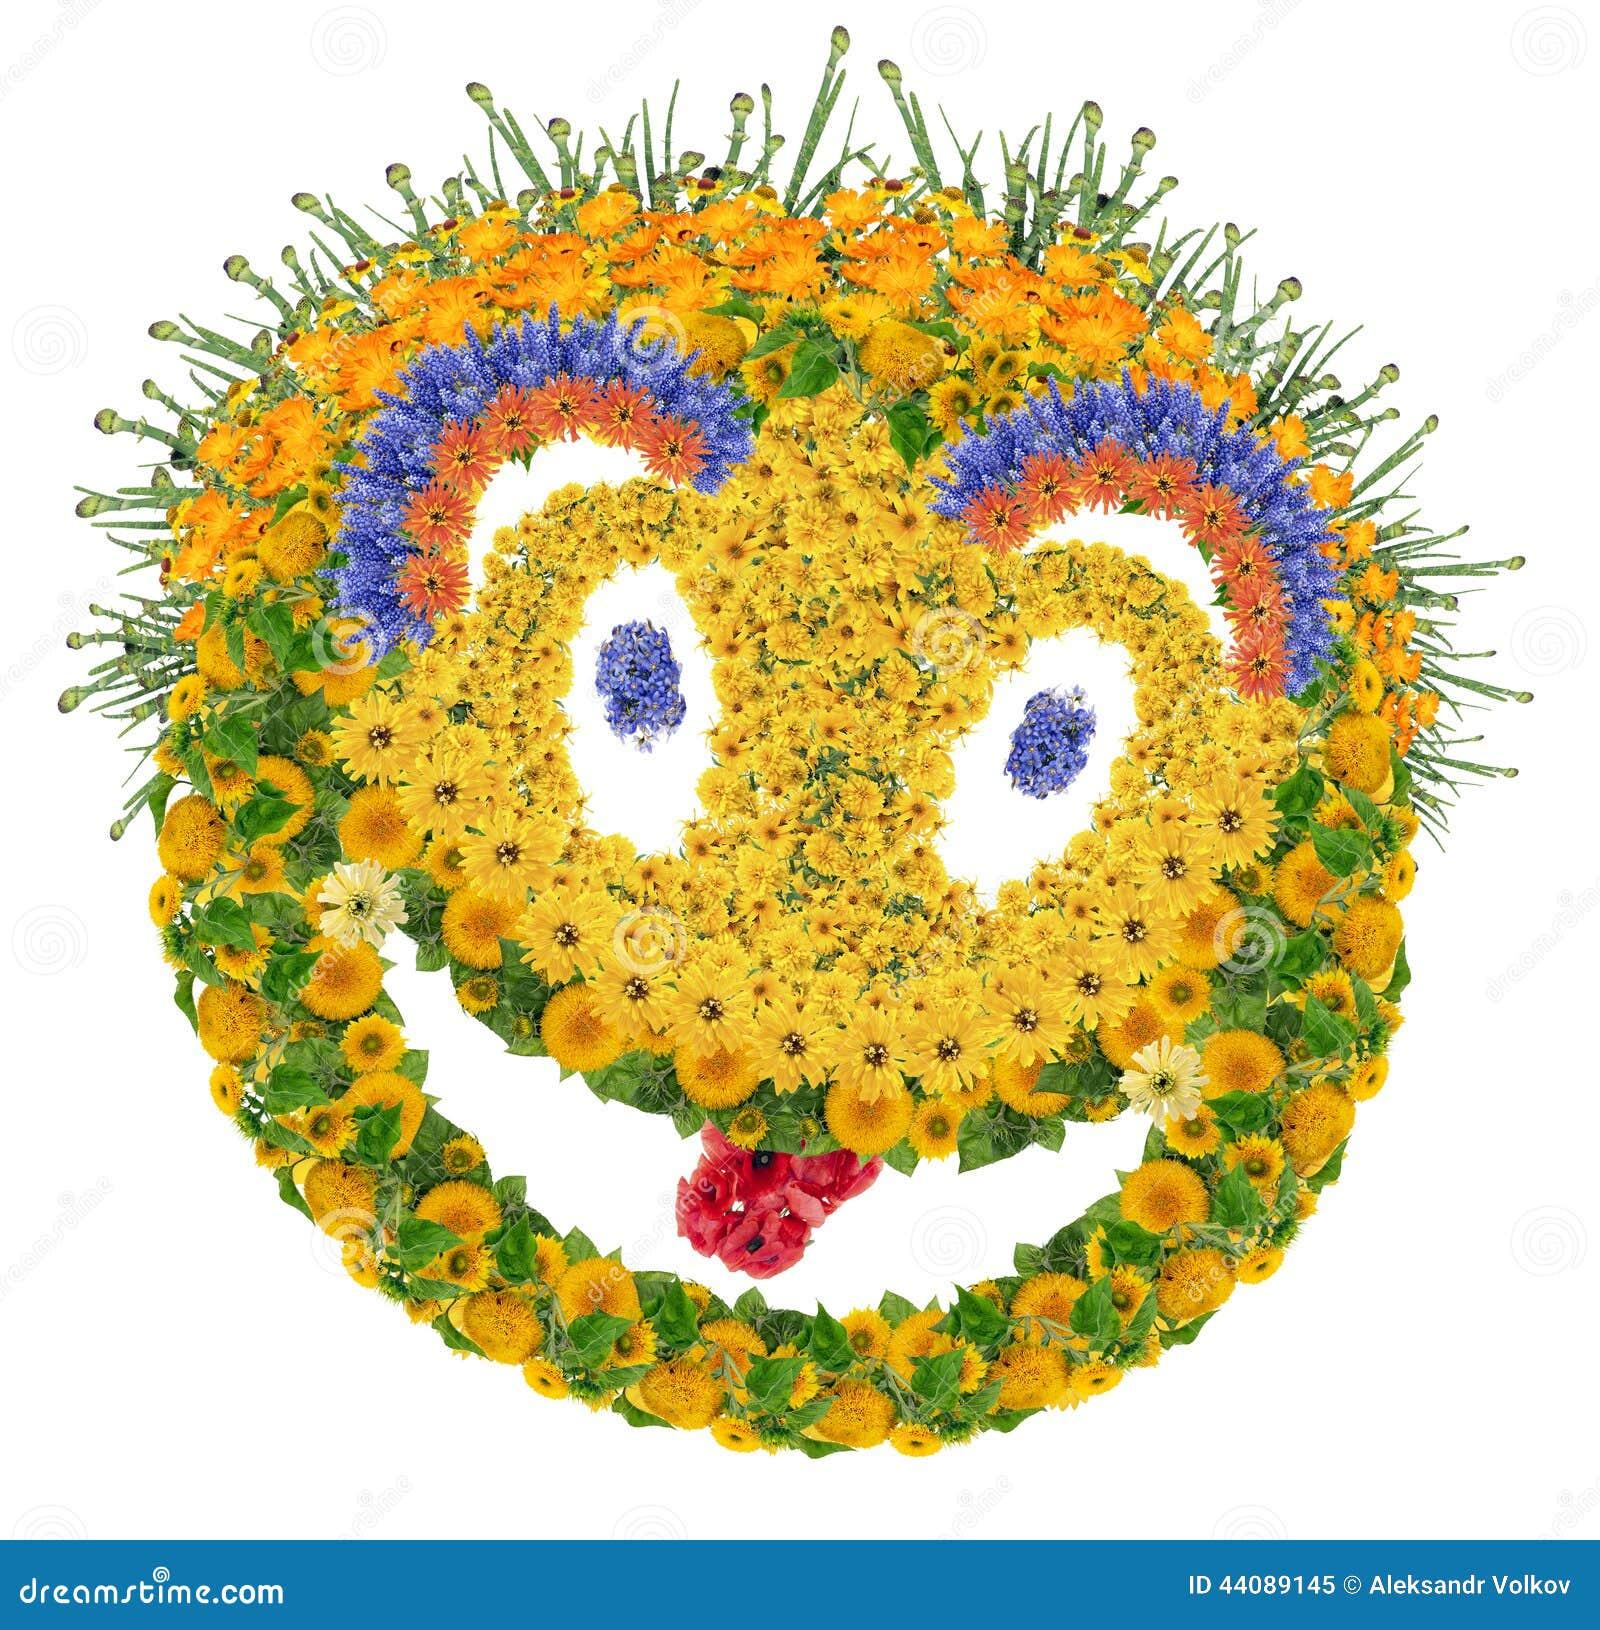 Sourire psychodelic floral